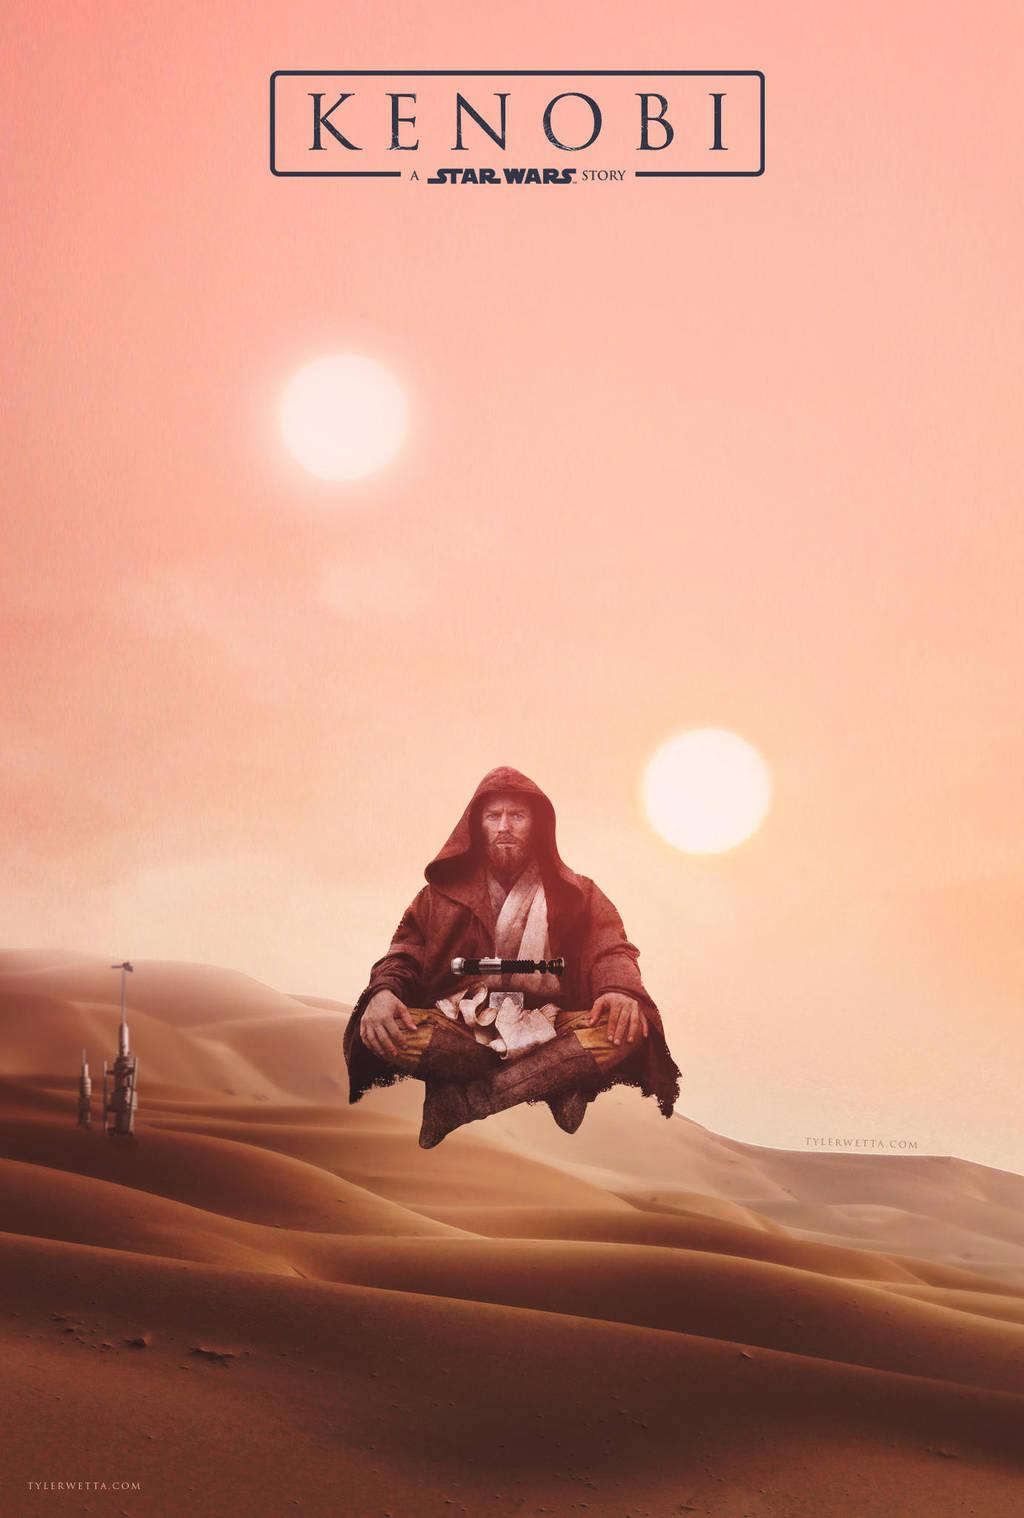 Kenobi: A Star Wars Story Movie Poster by tyler-wetta